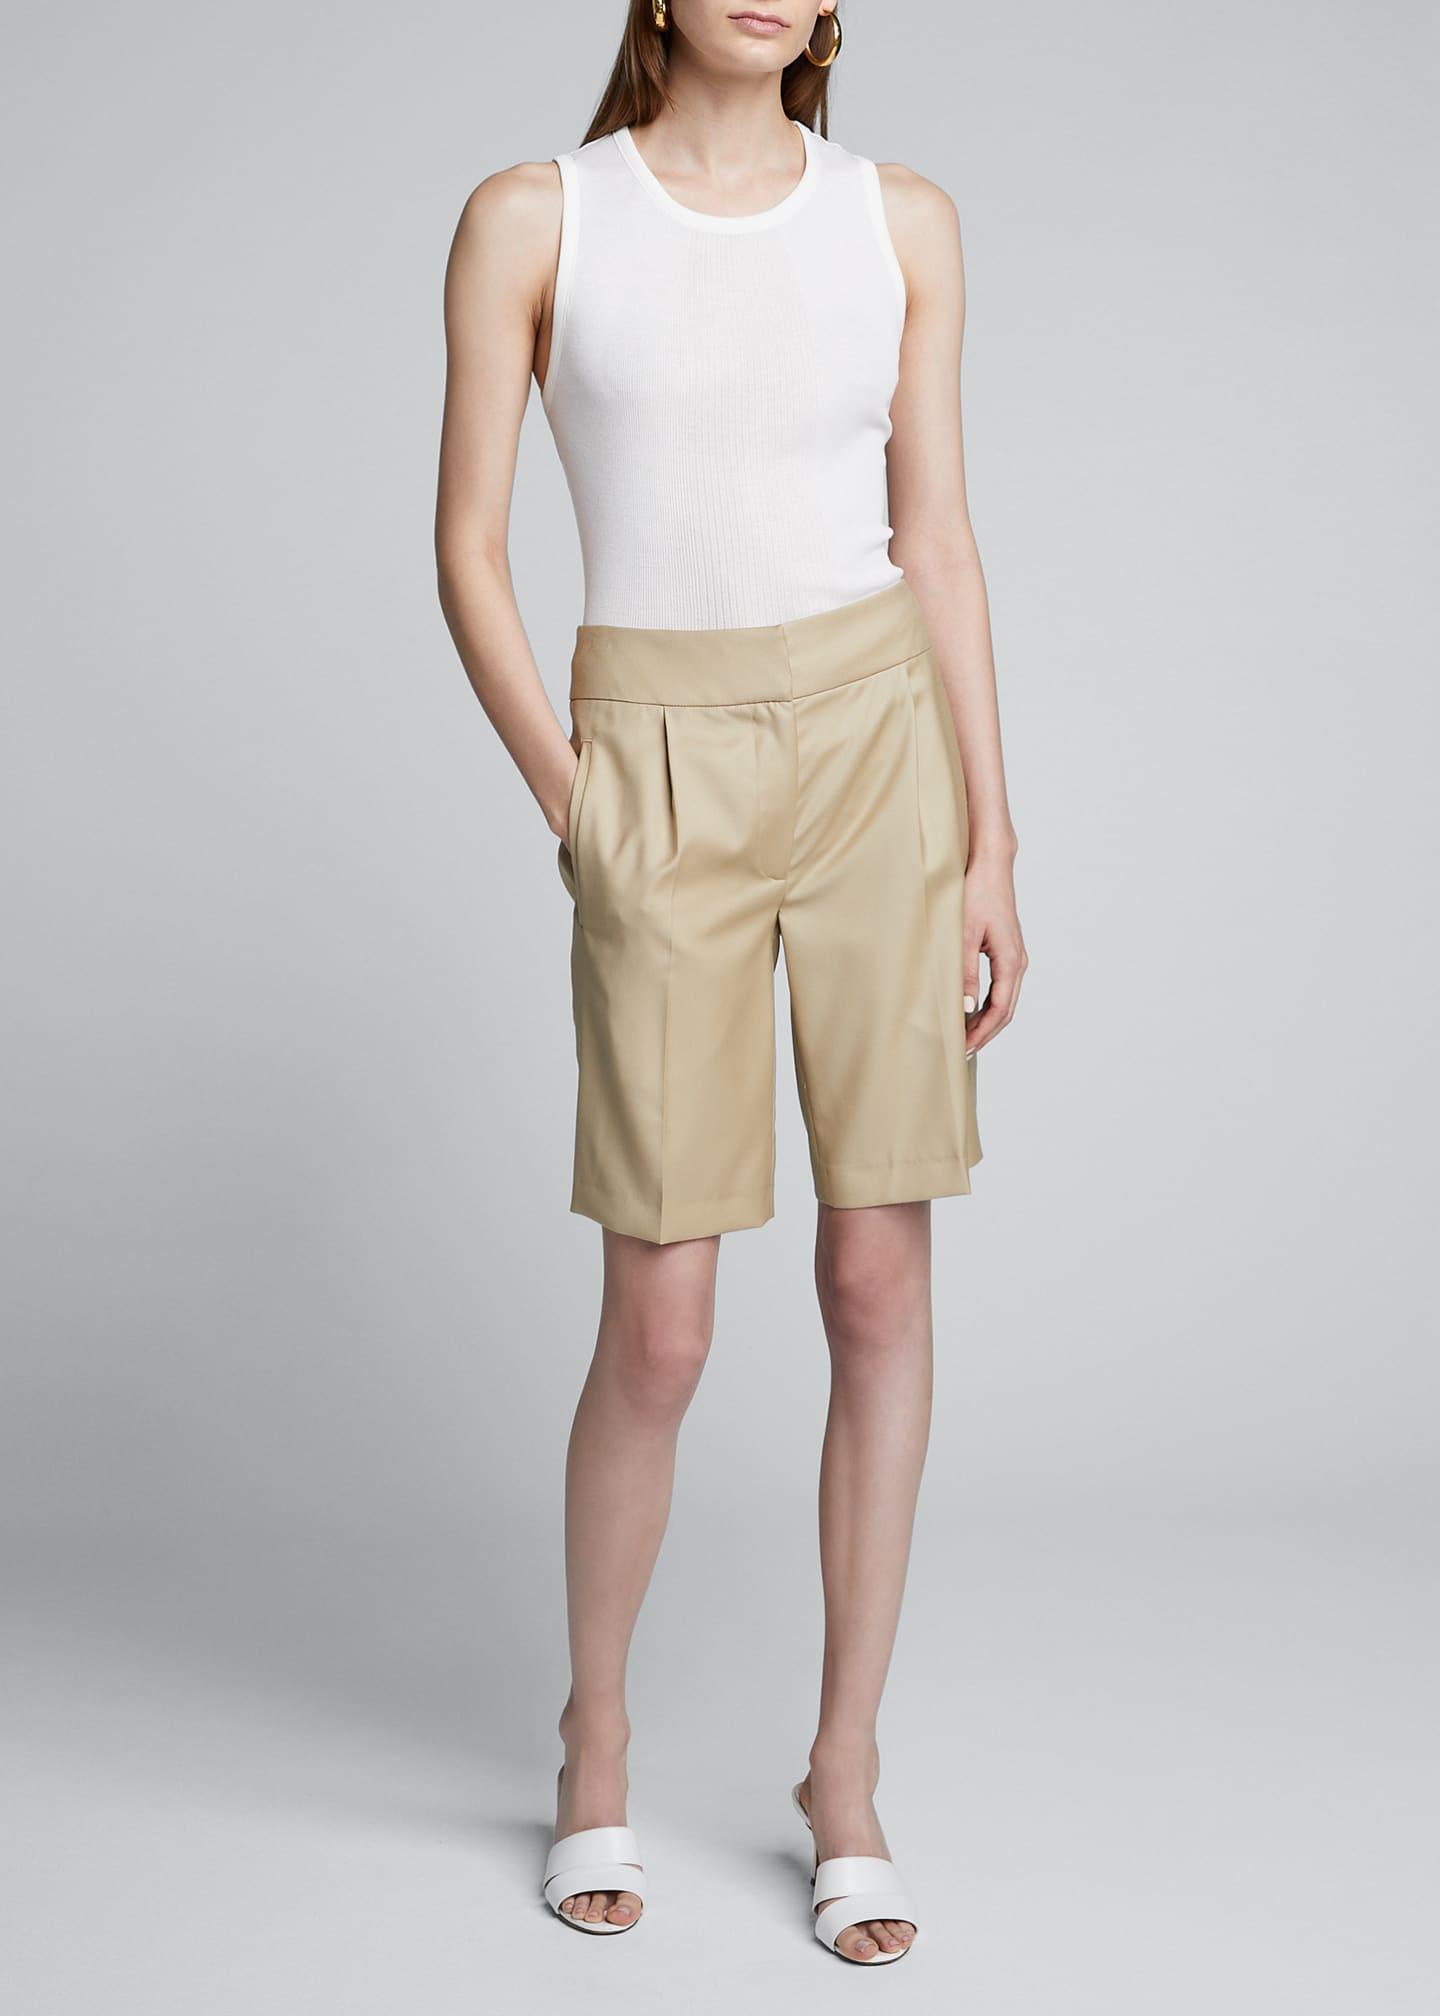 Loulou Studio Wool Suiting Knee Shorts